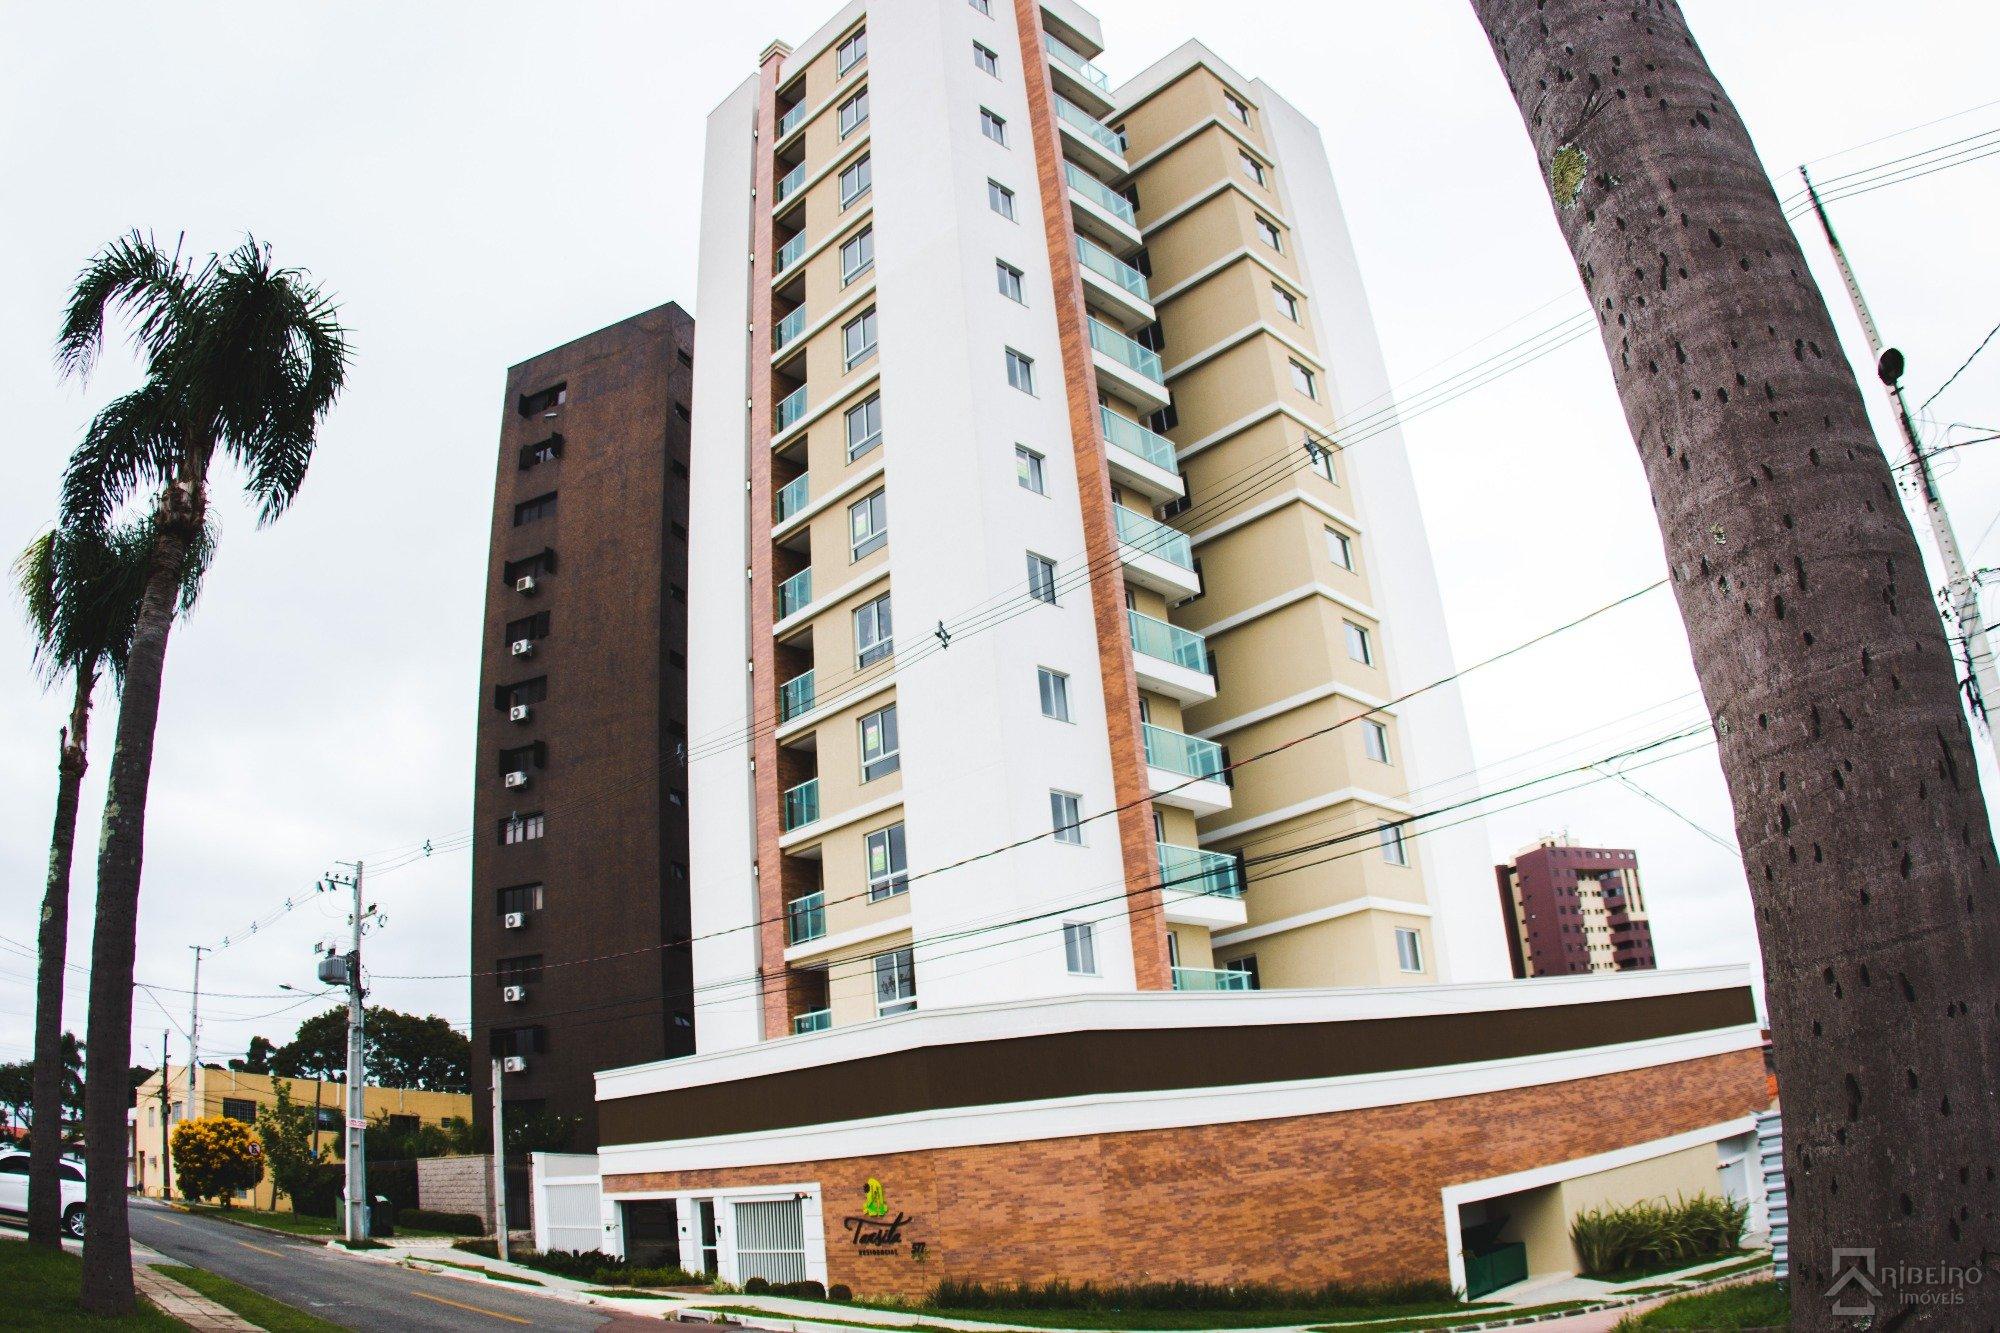 REF. 7363 -  Sao Jose Dos Pinhais - Rua  Clemente Zetola, 577 - Apto 801